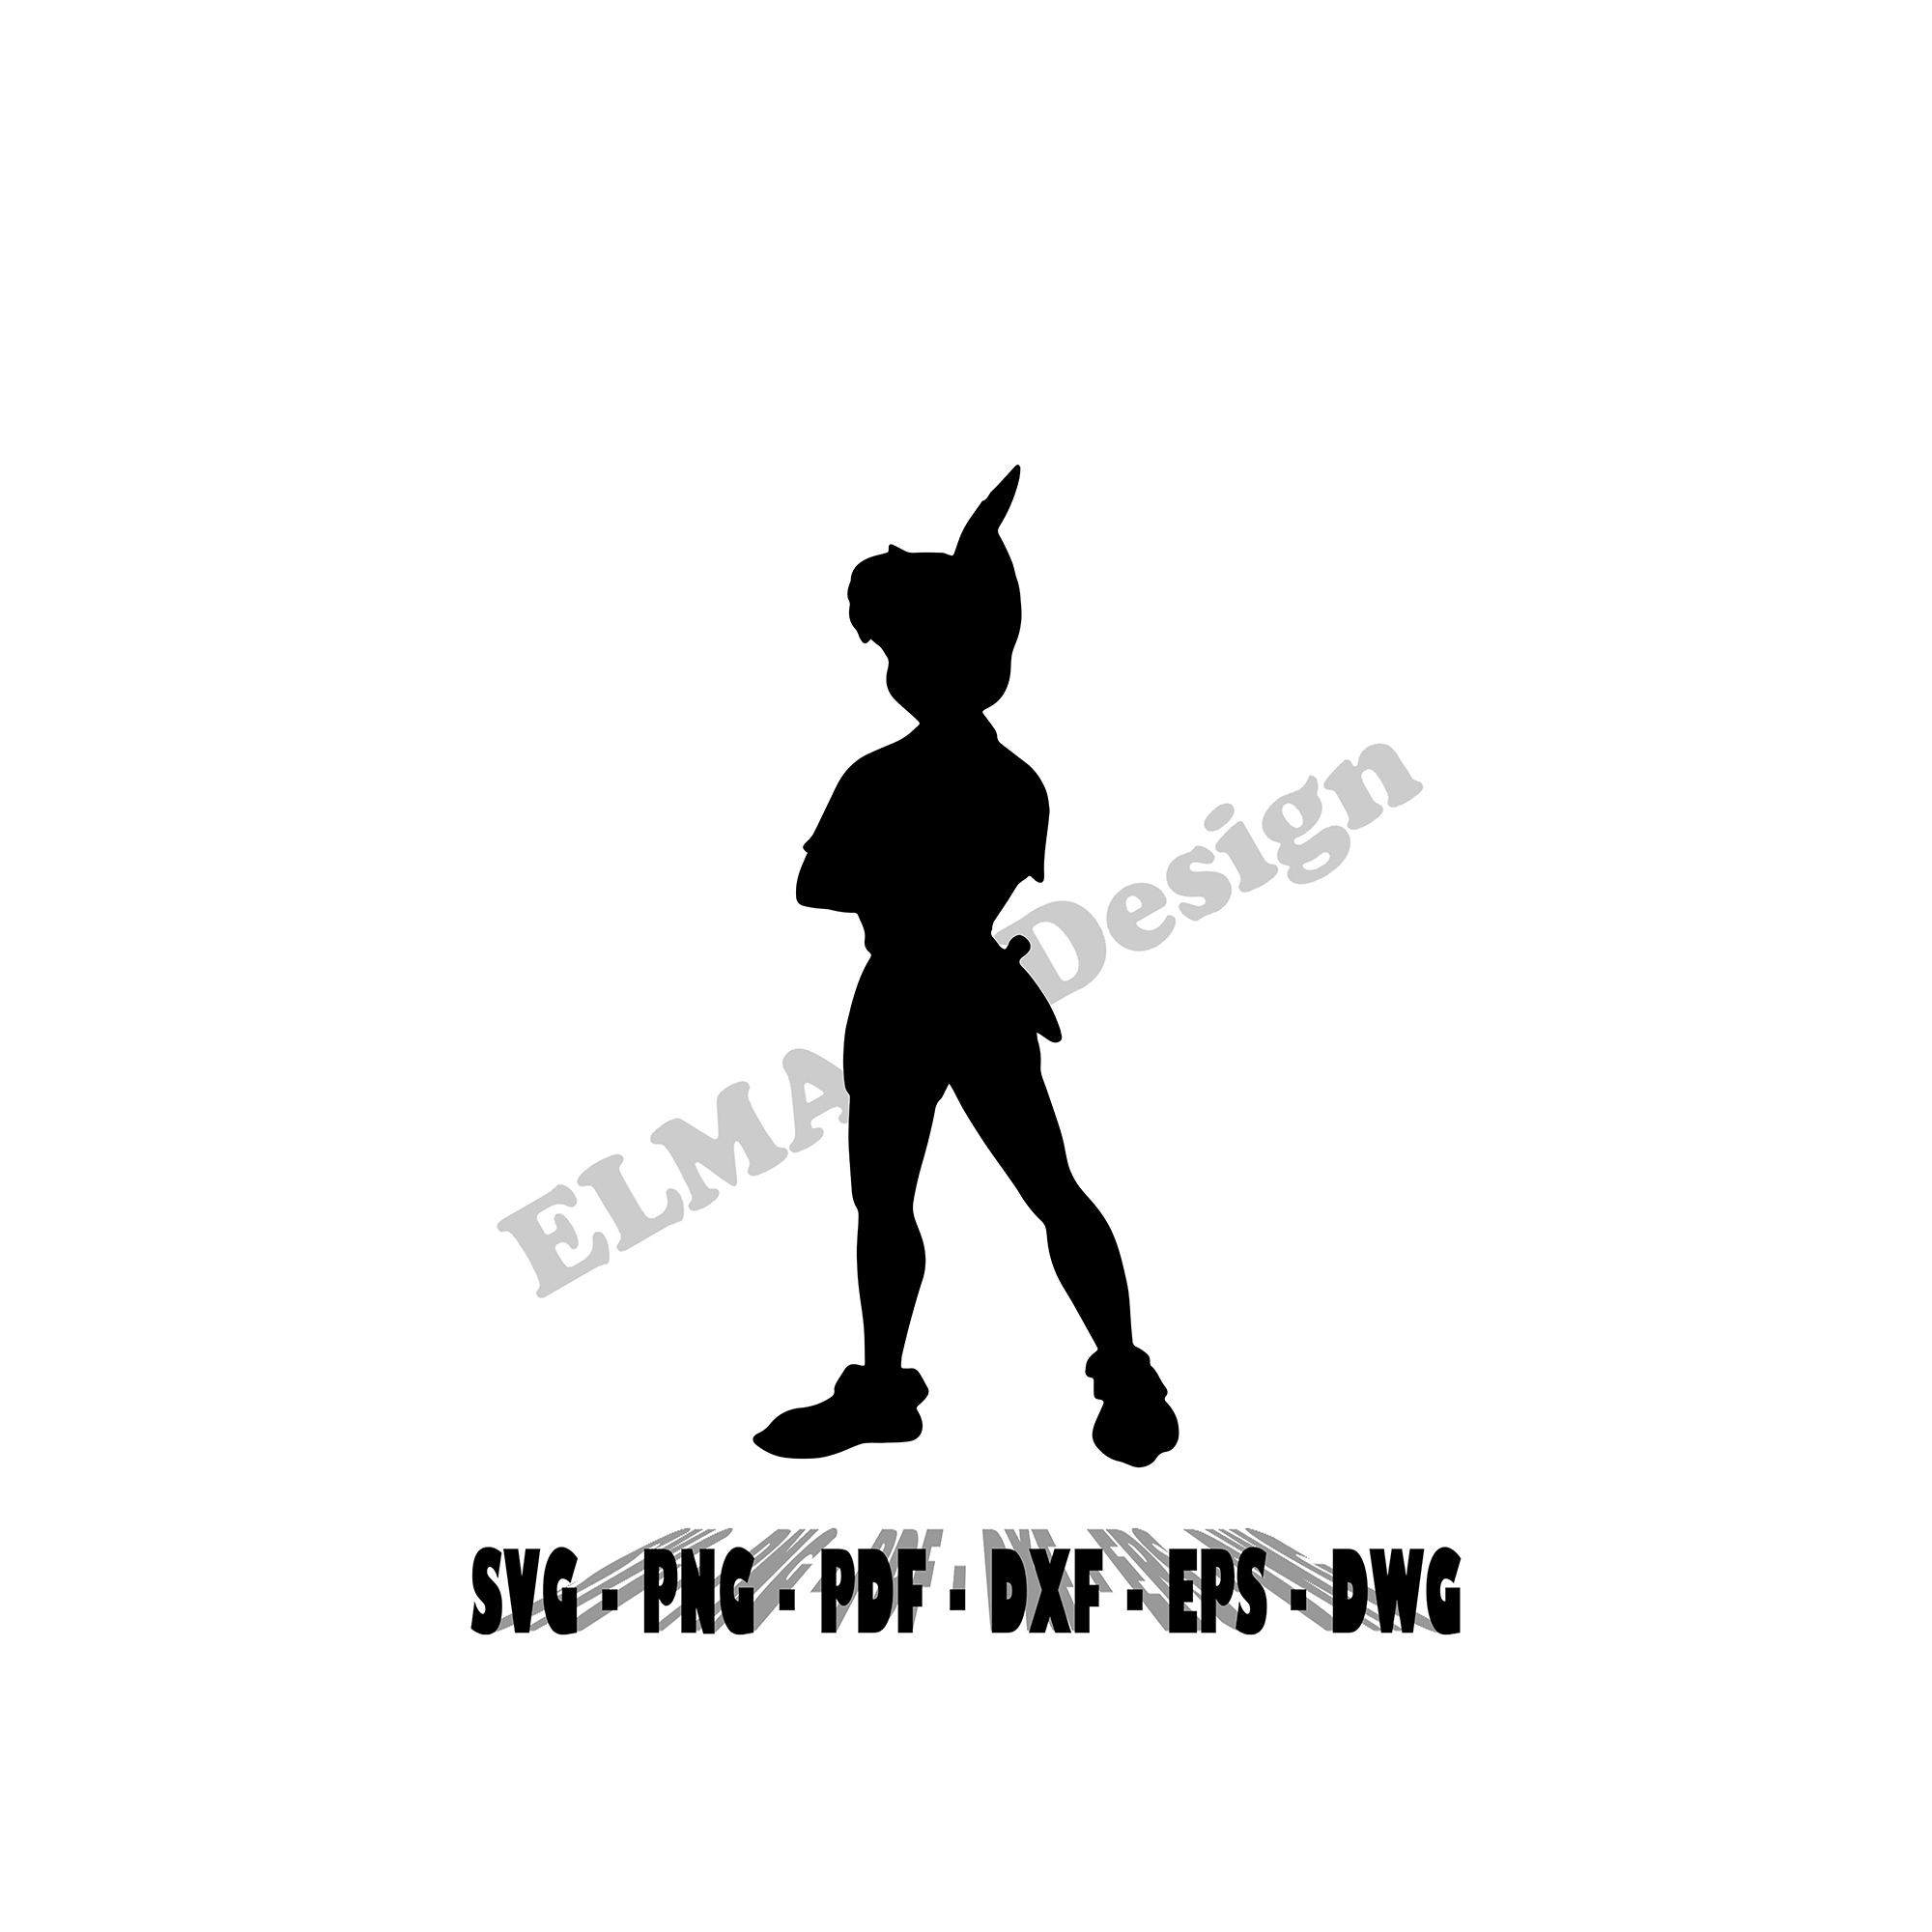 Disney the little Mermaid cartoons stencil profile 5 formats stencils digital svg dwg dxf png pdf Silhouette cut cutting files sewing sing